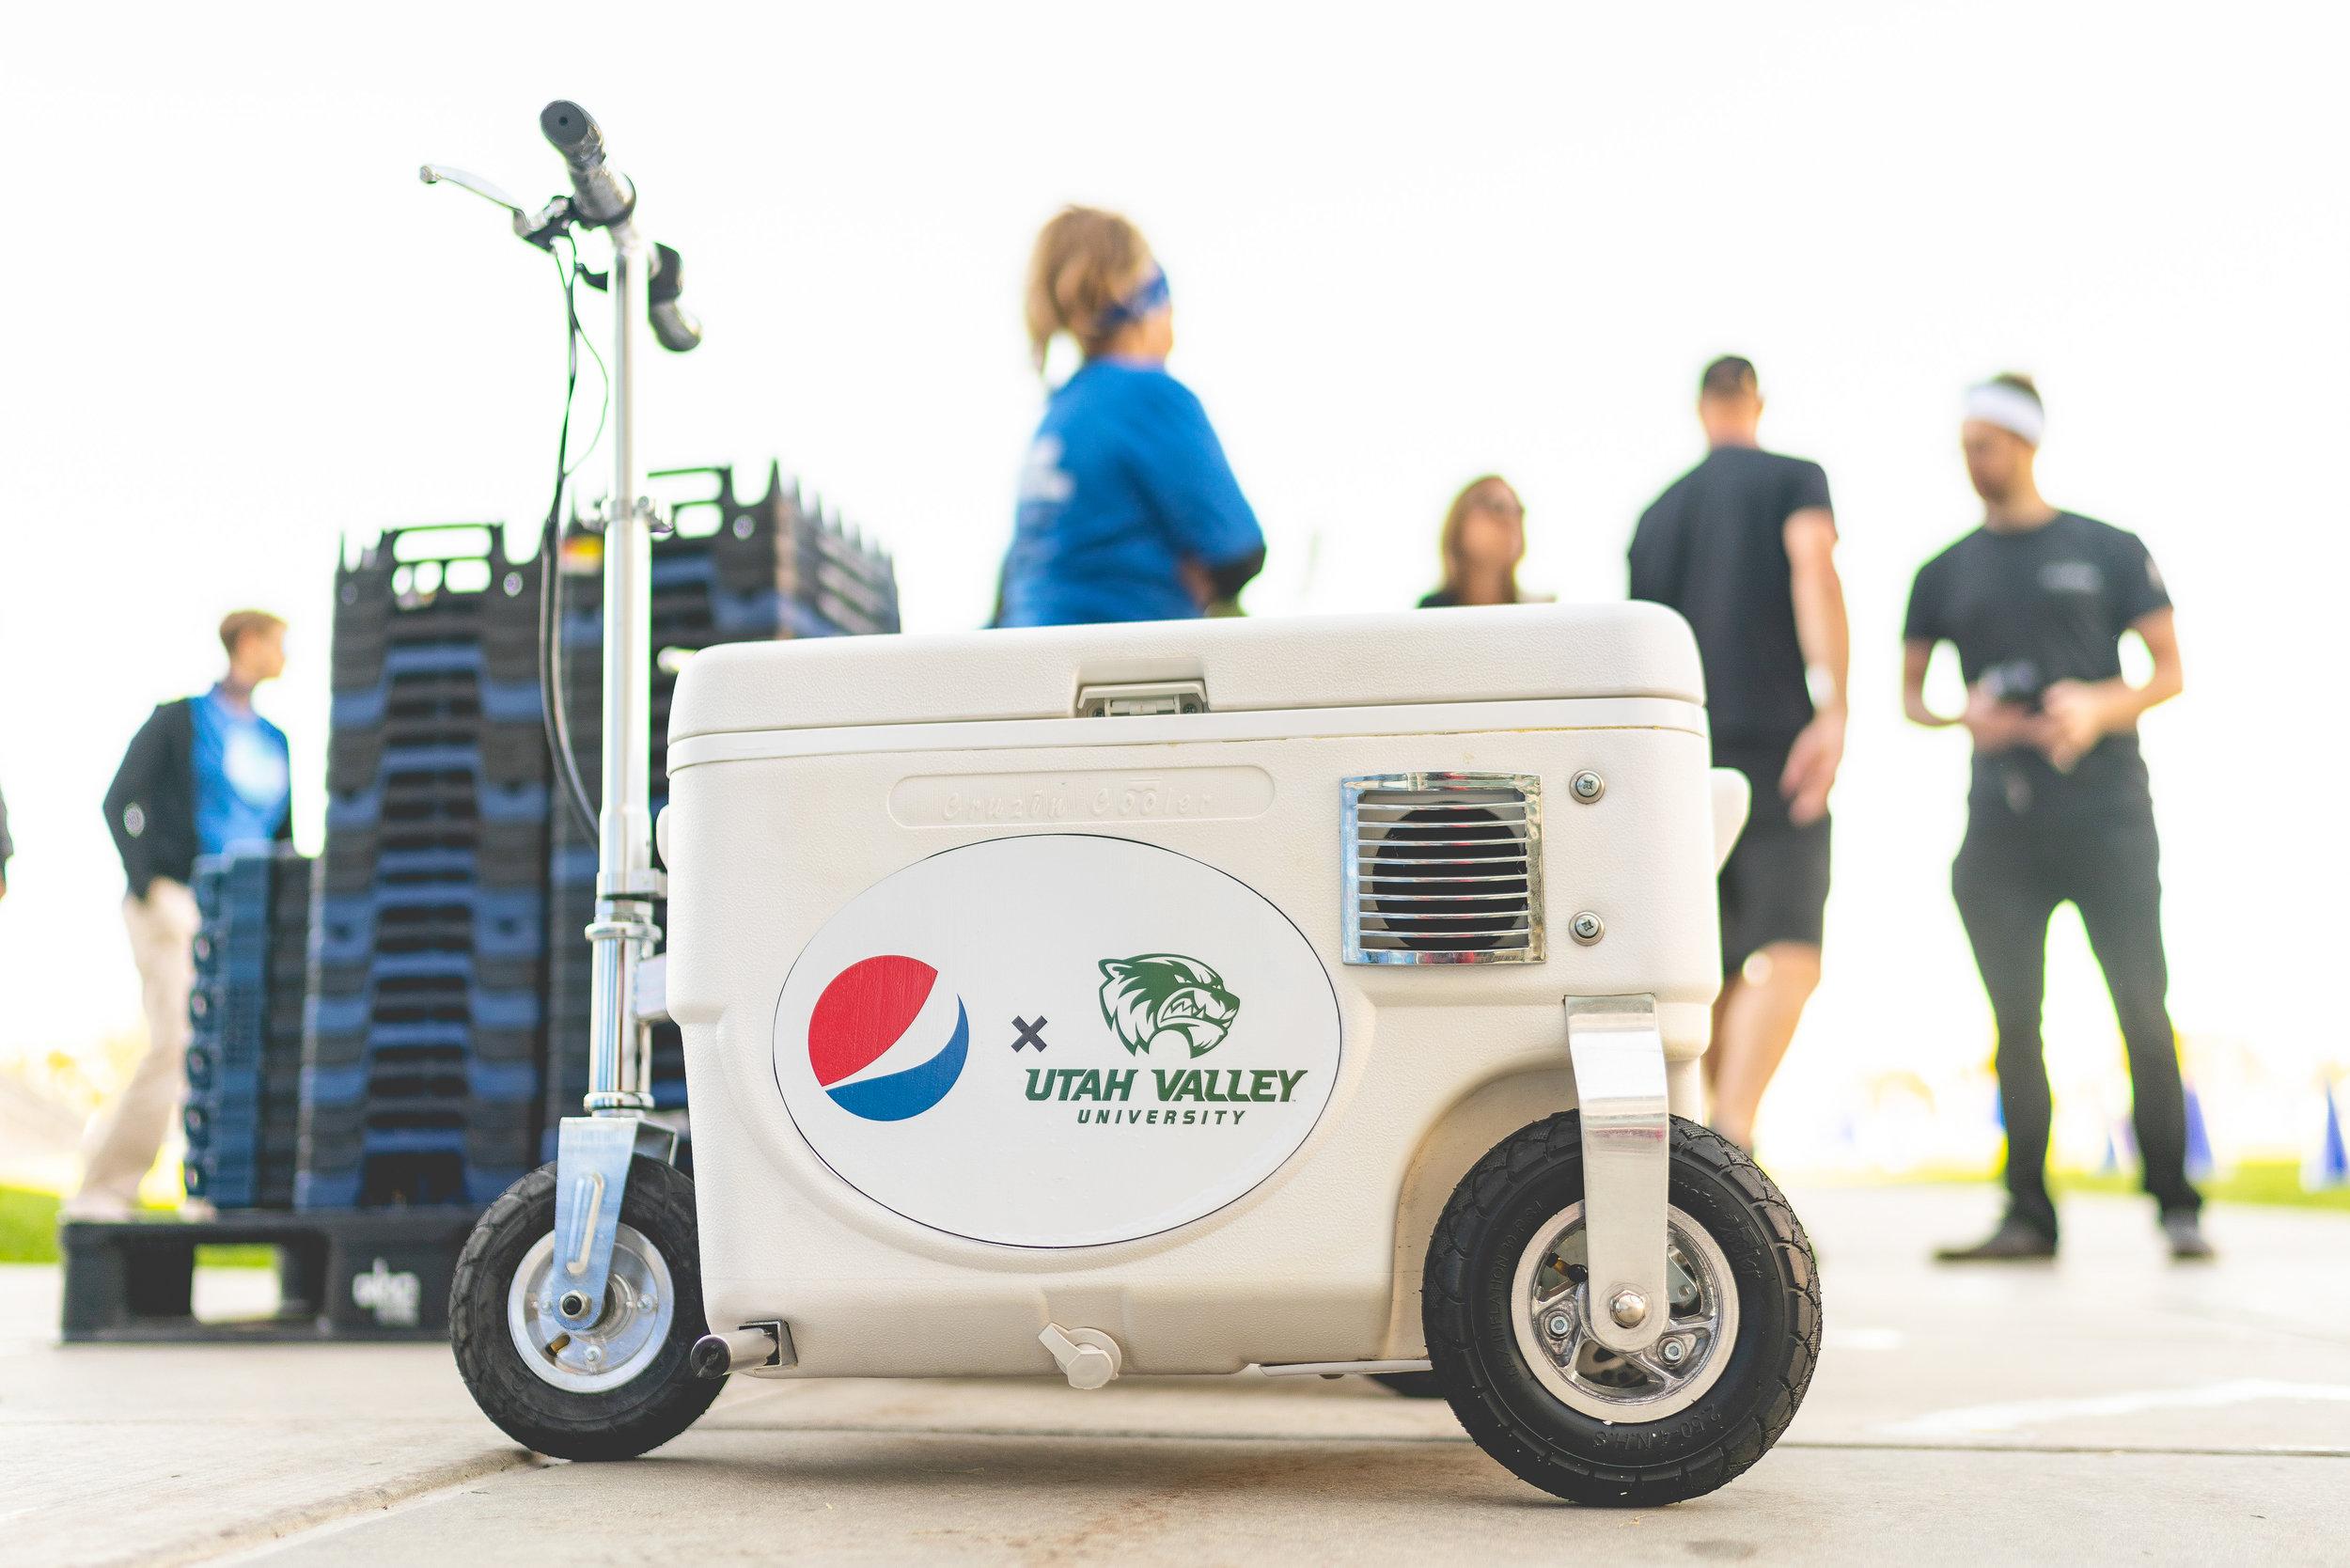 OHelloMedia-Pepsi-UVUHomecoming-9.28-36.jpg